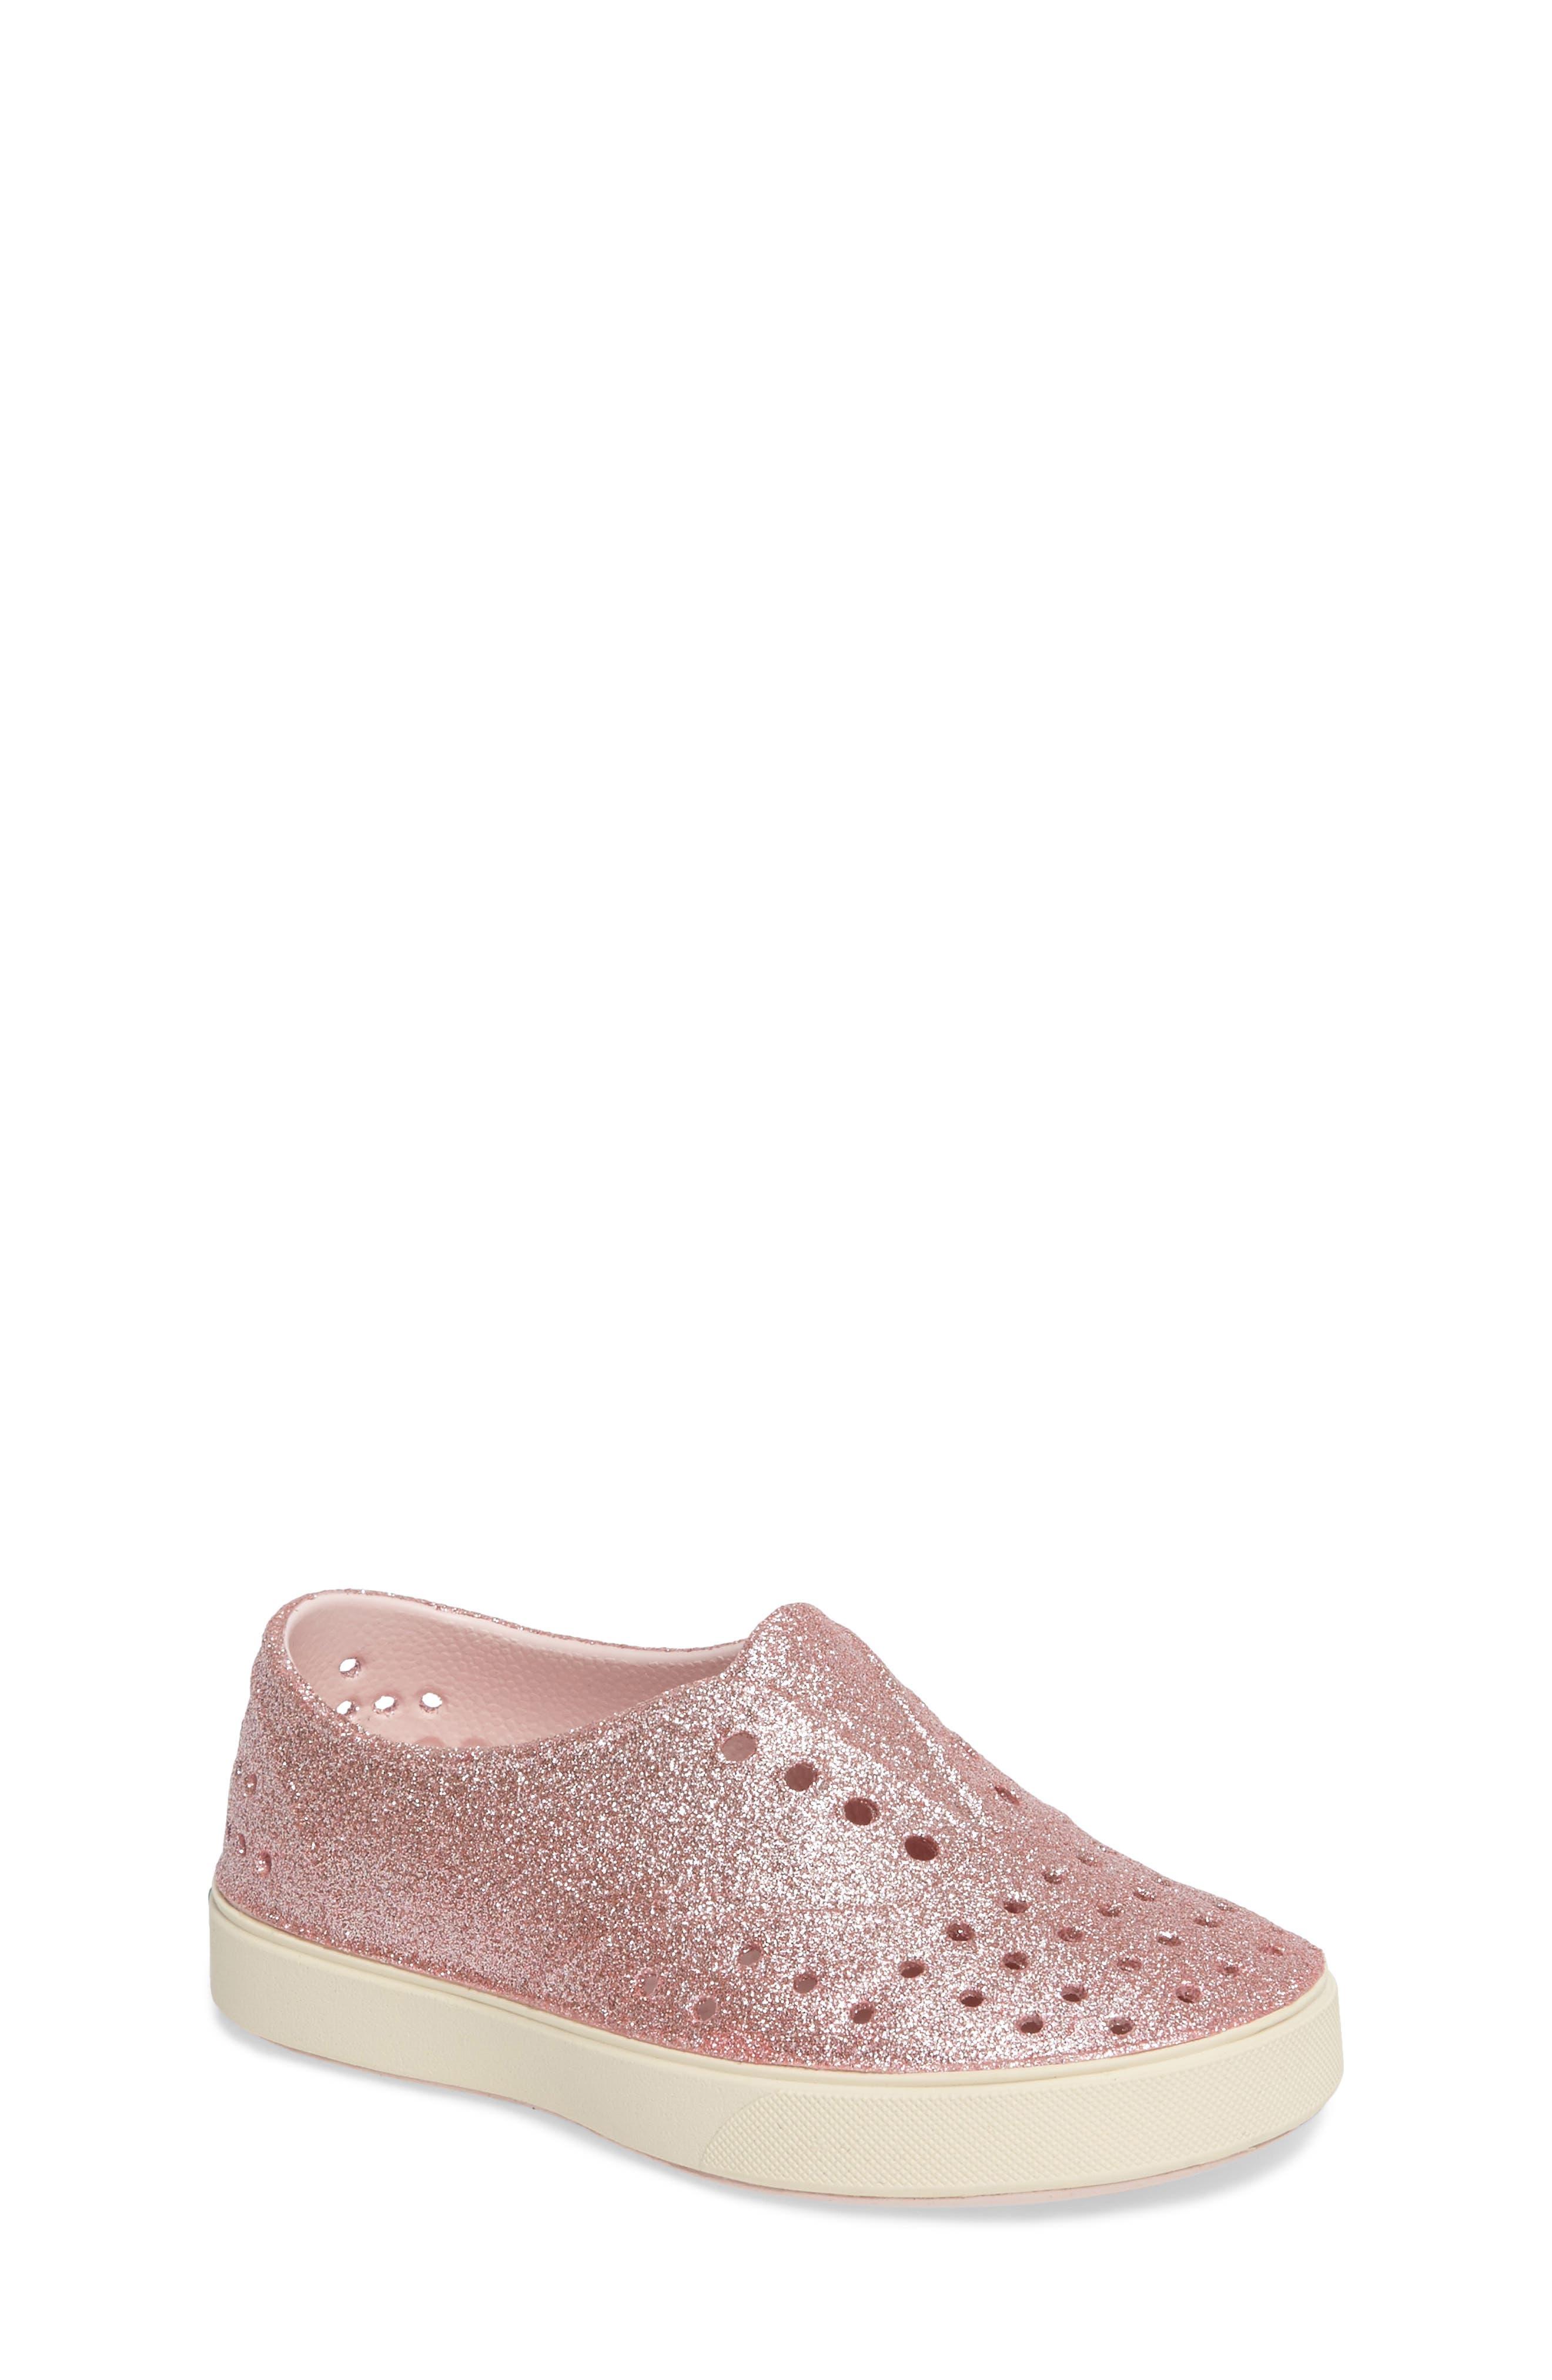 Native Shoes Miller Sparkly Perforated Slip-On (Walker, Toddler & Little Kid)